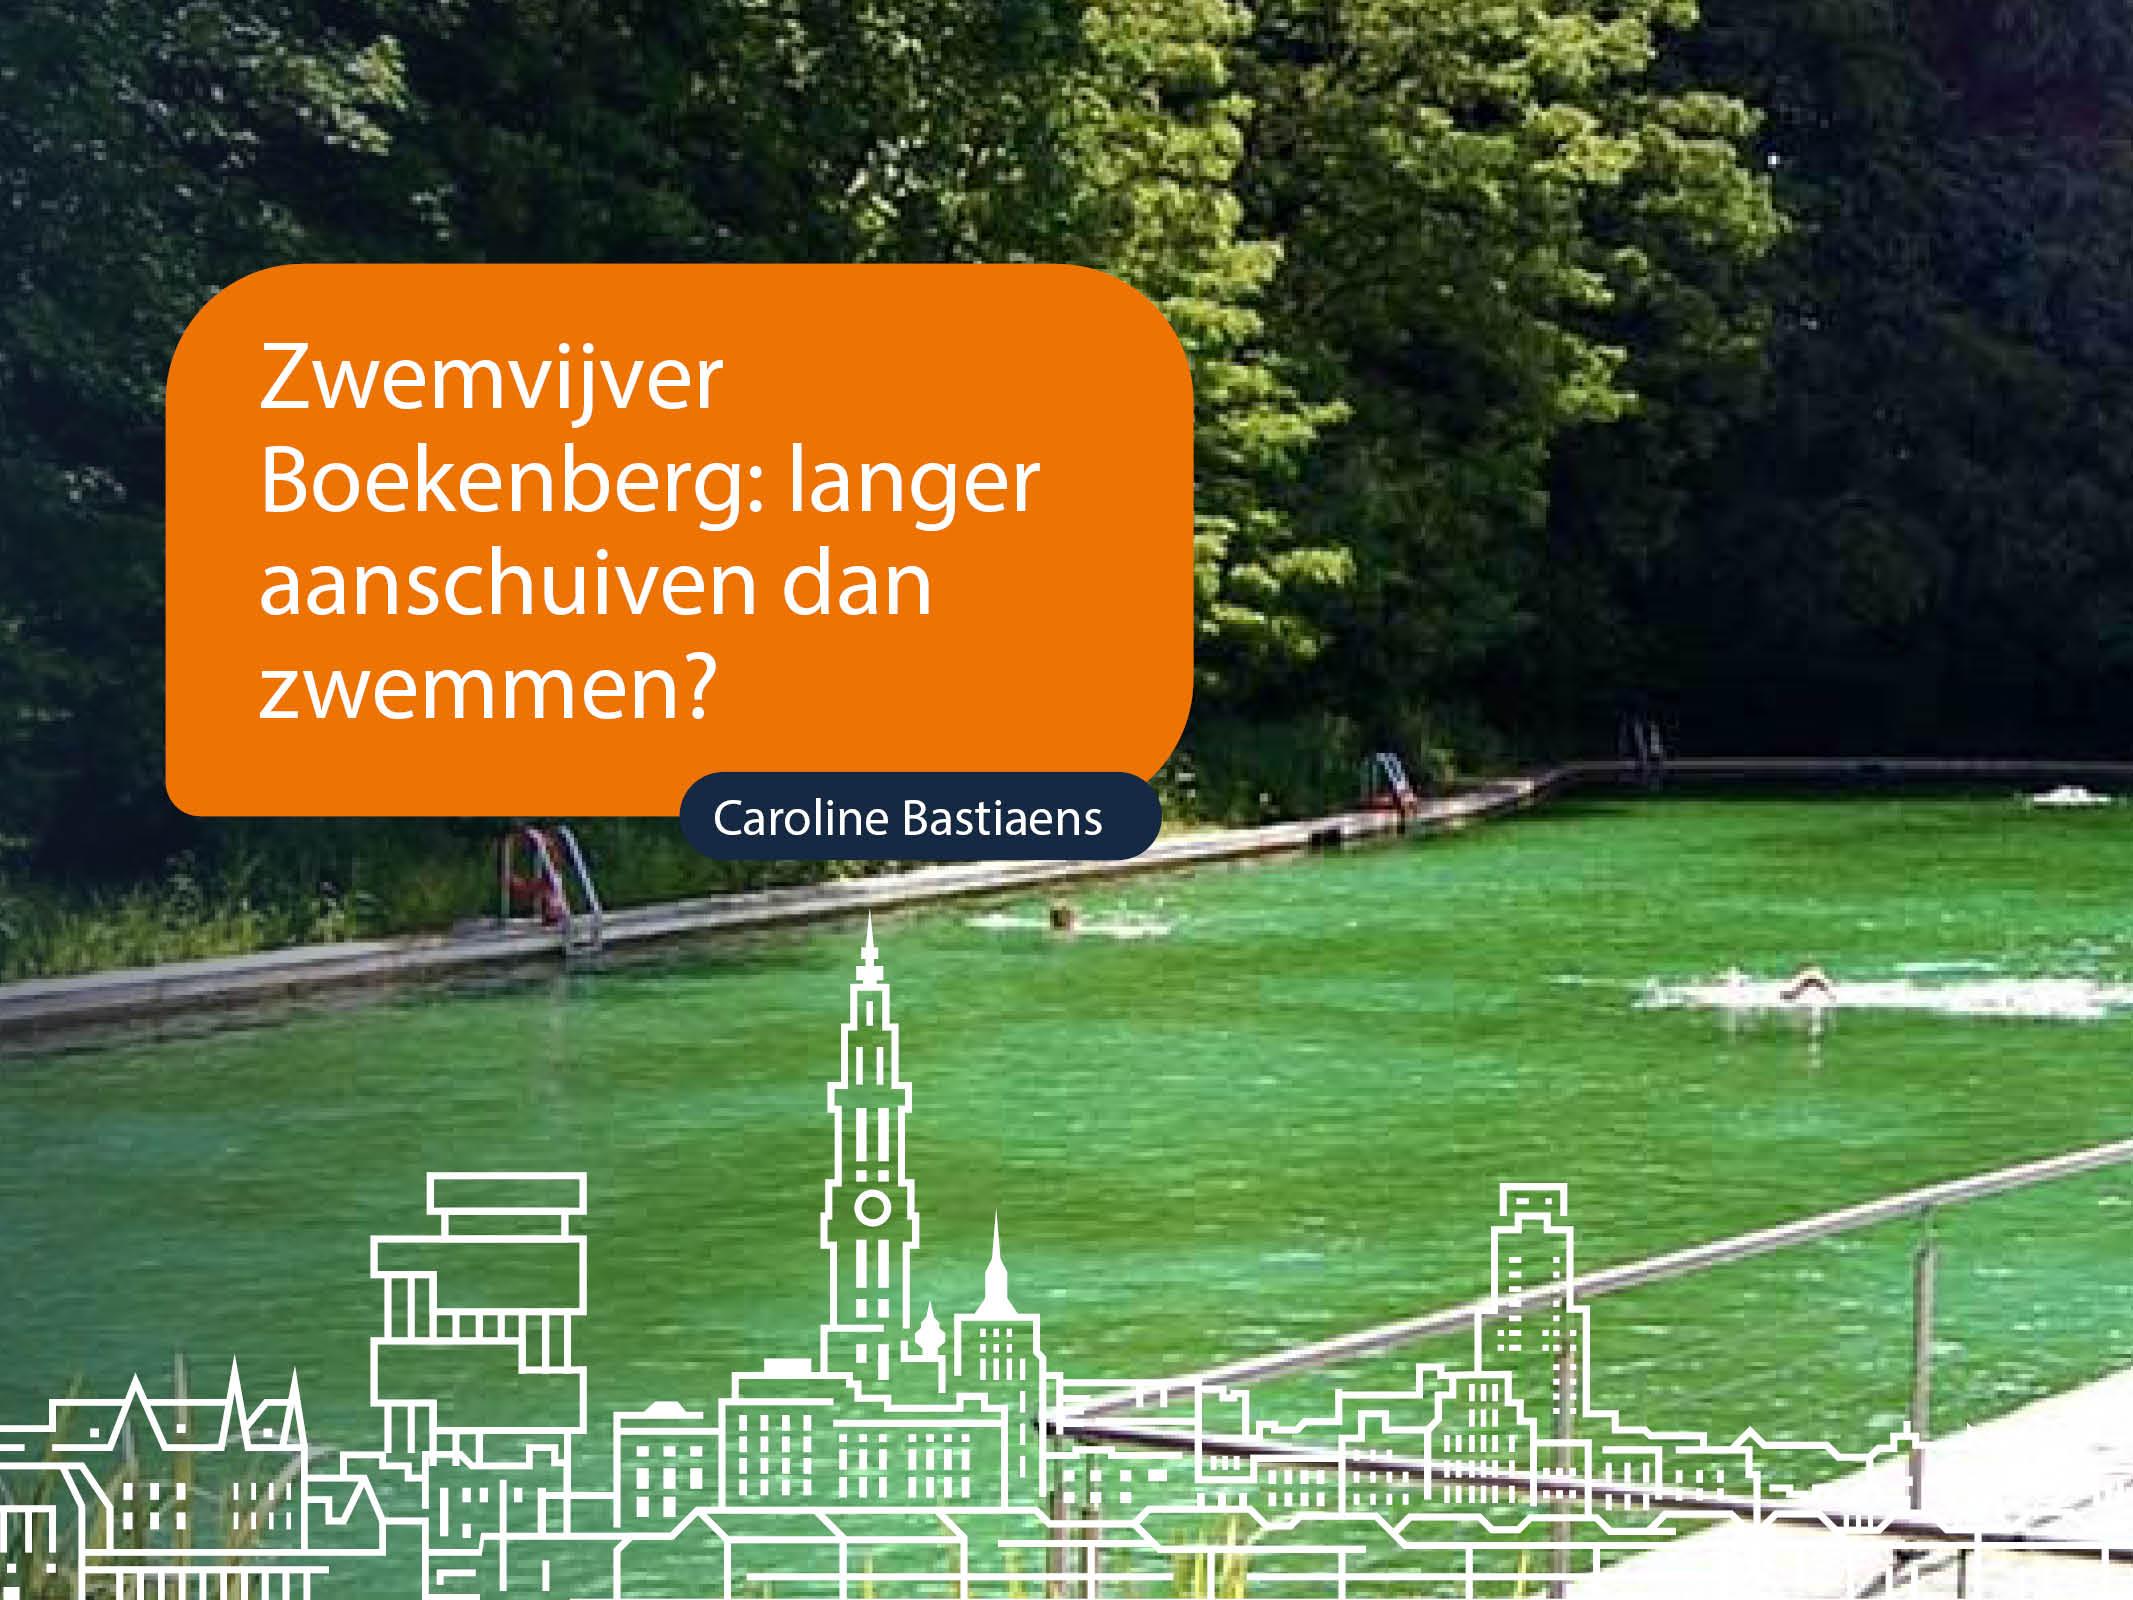 Zwemvijver Boekenberg